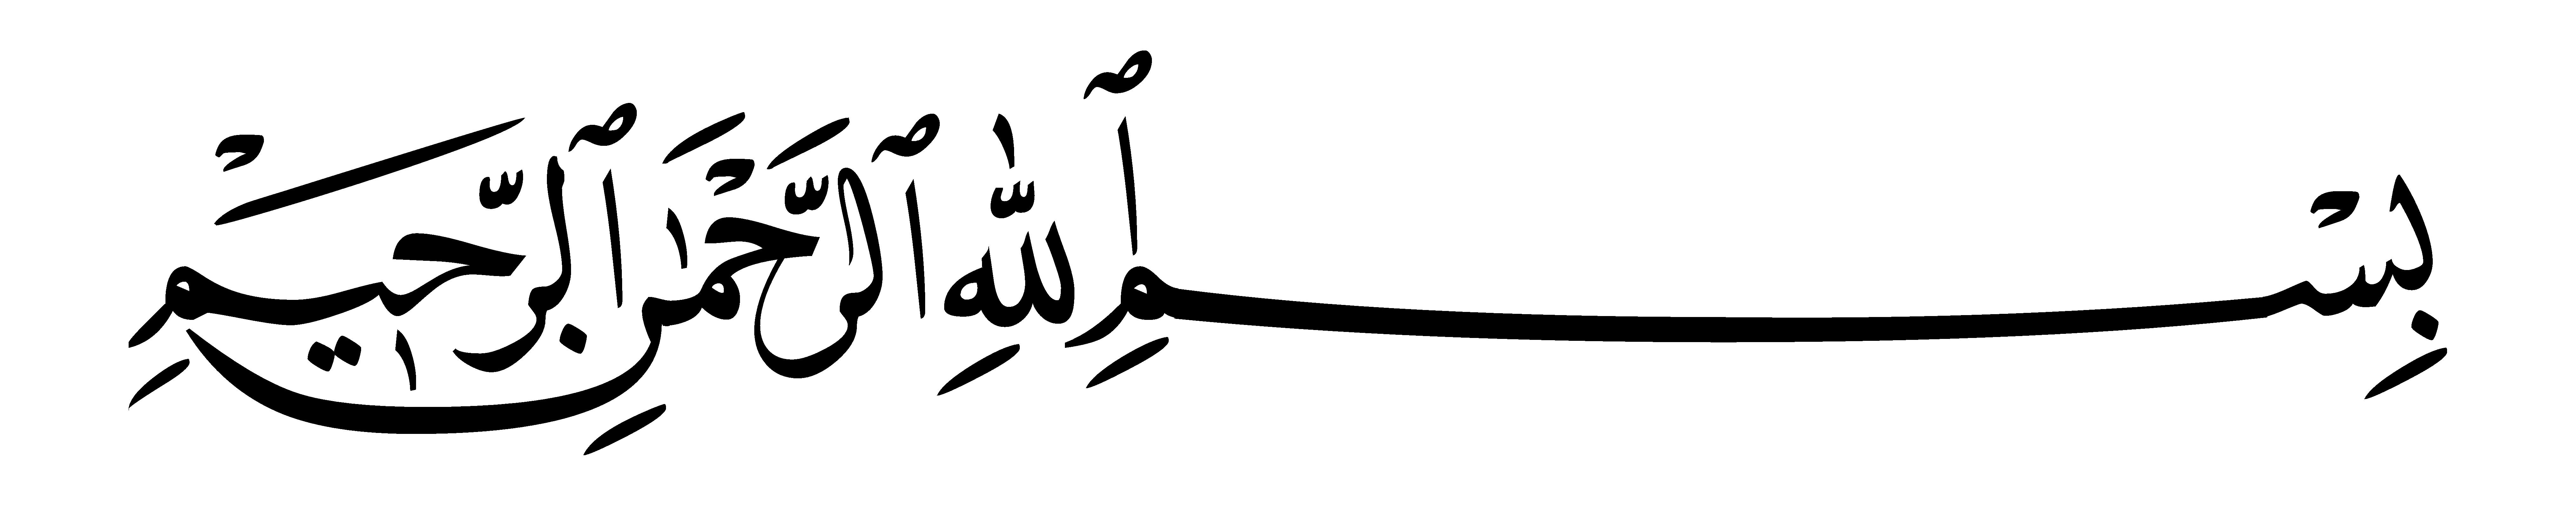 islamic calligraphy bismillah vector clipart best